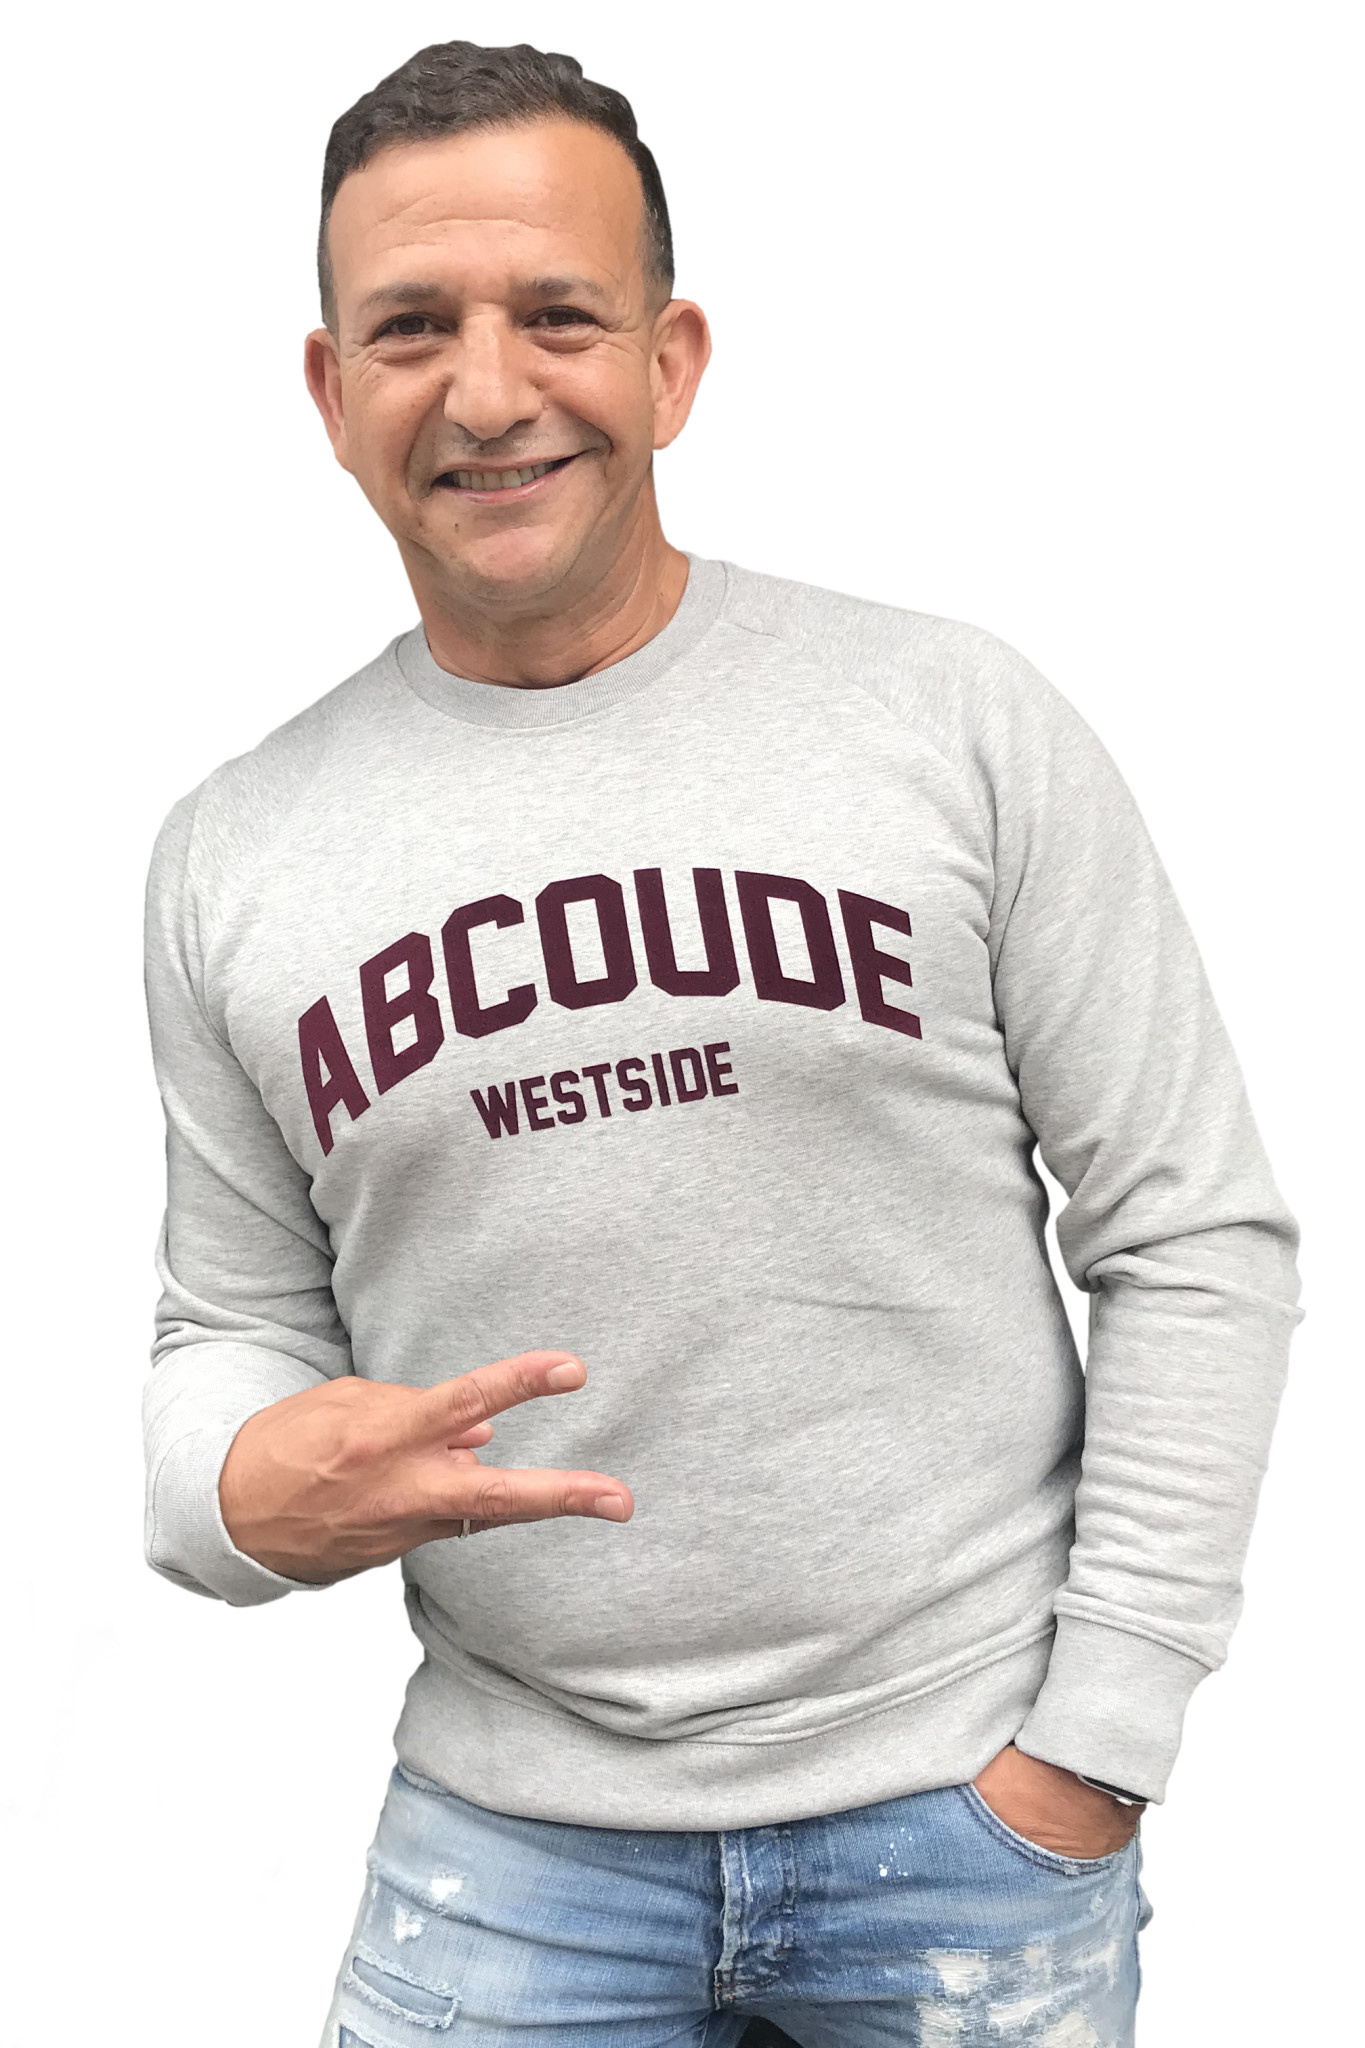 Original Abcoude Westside Sweater